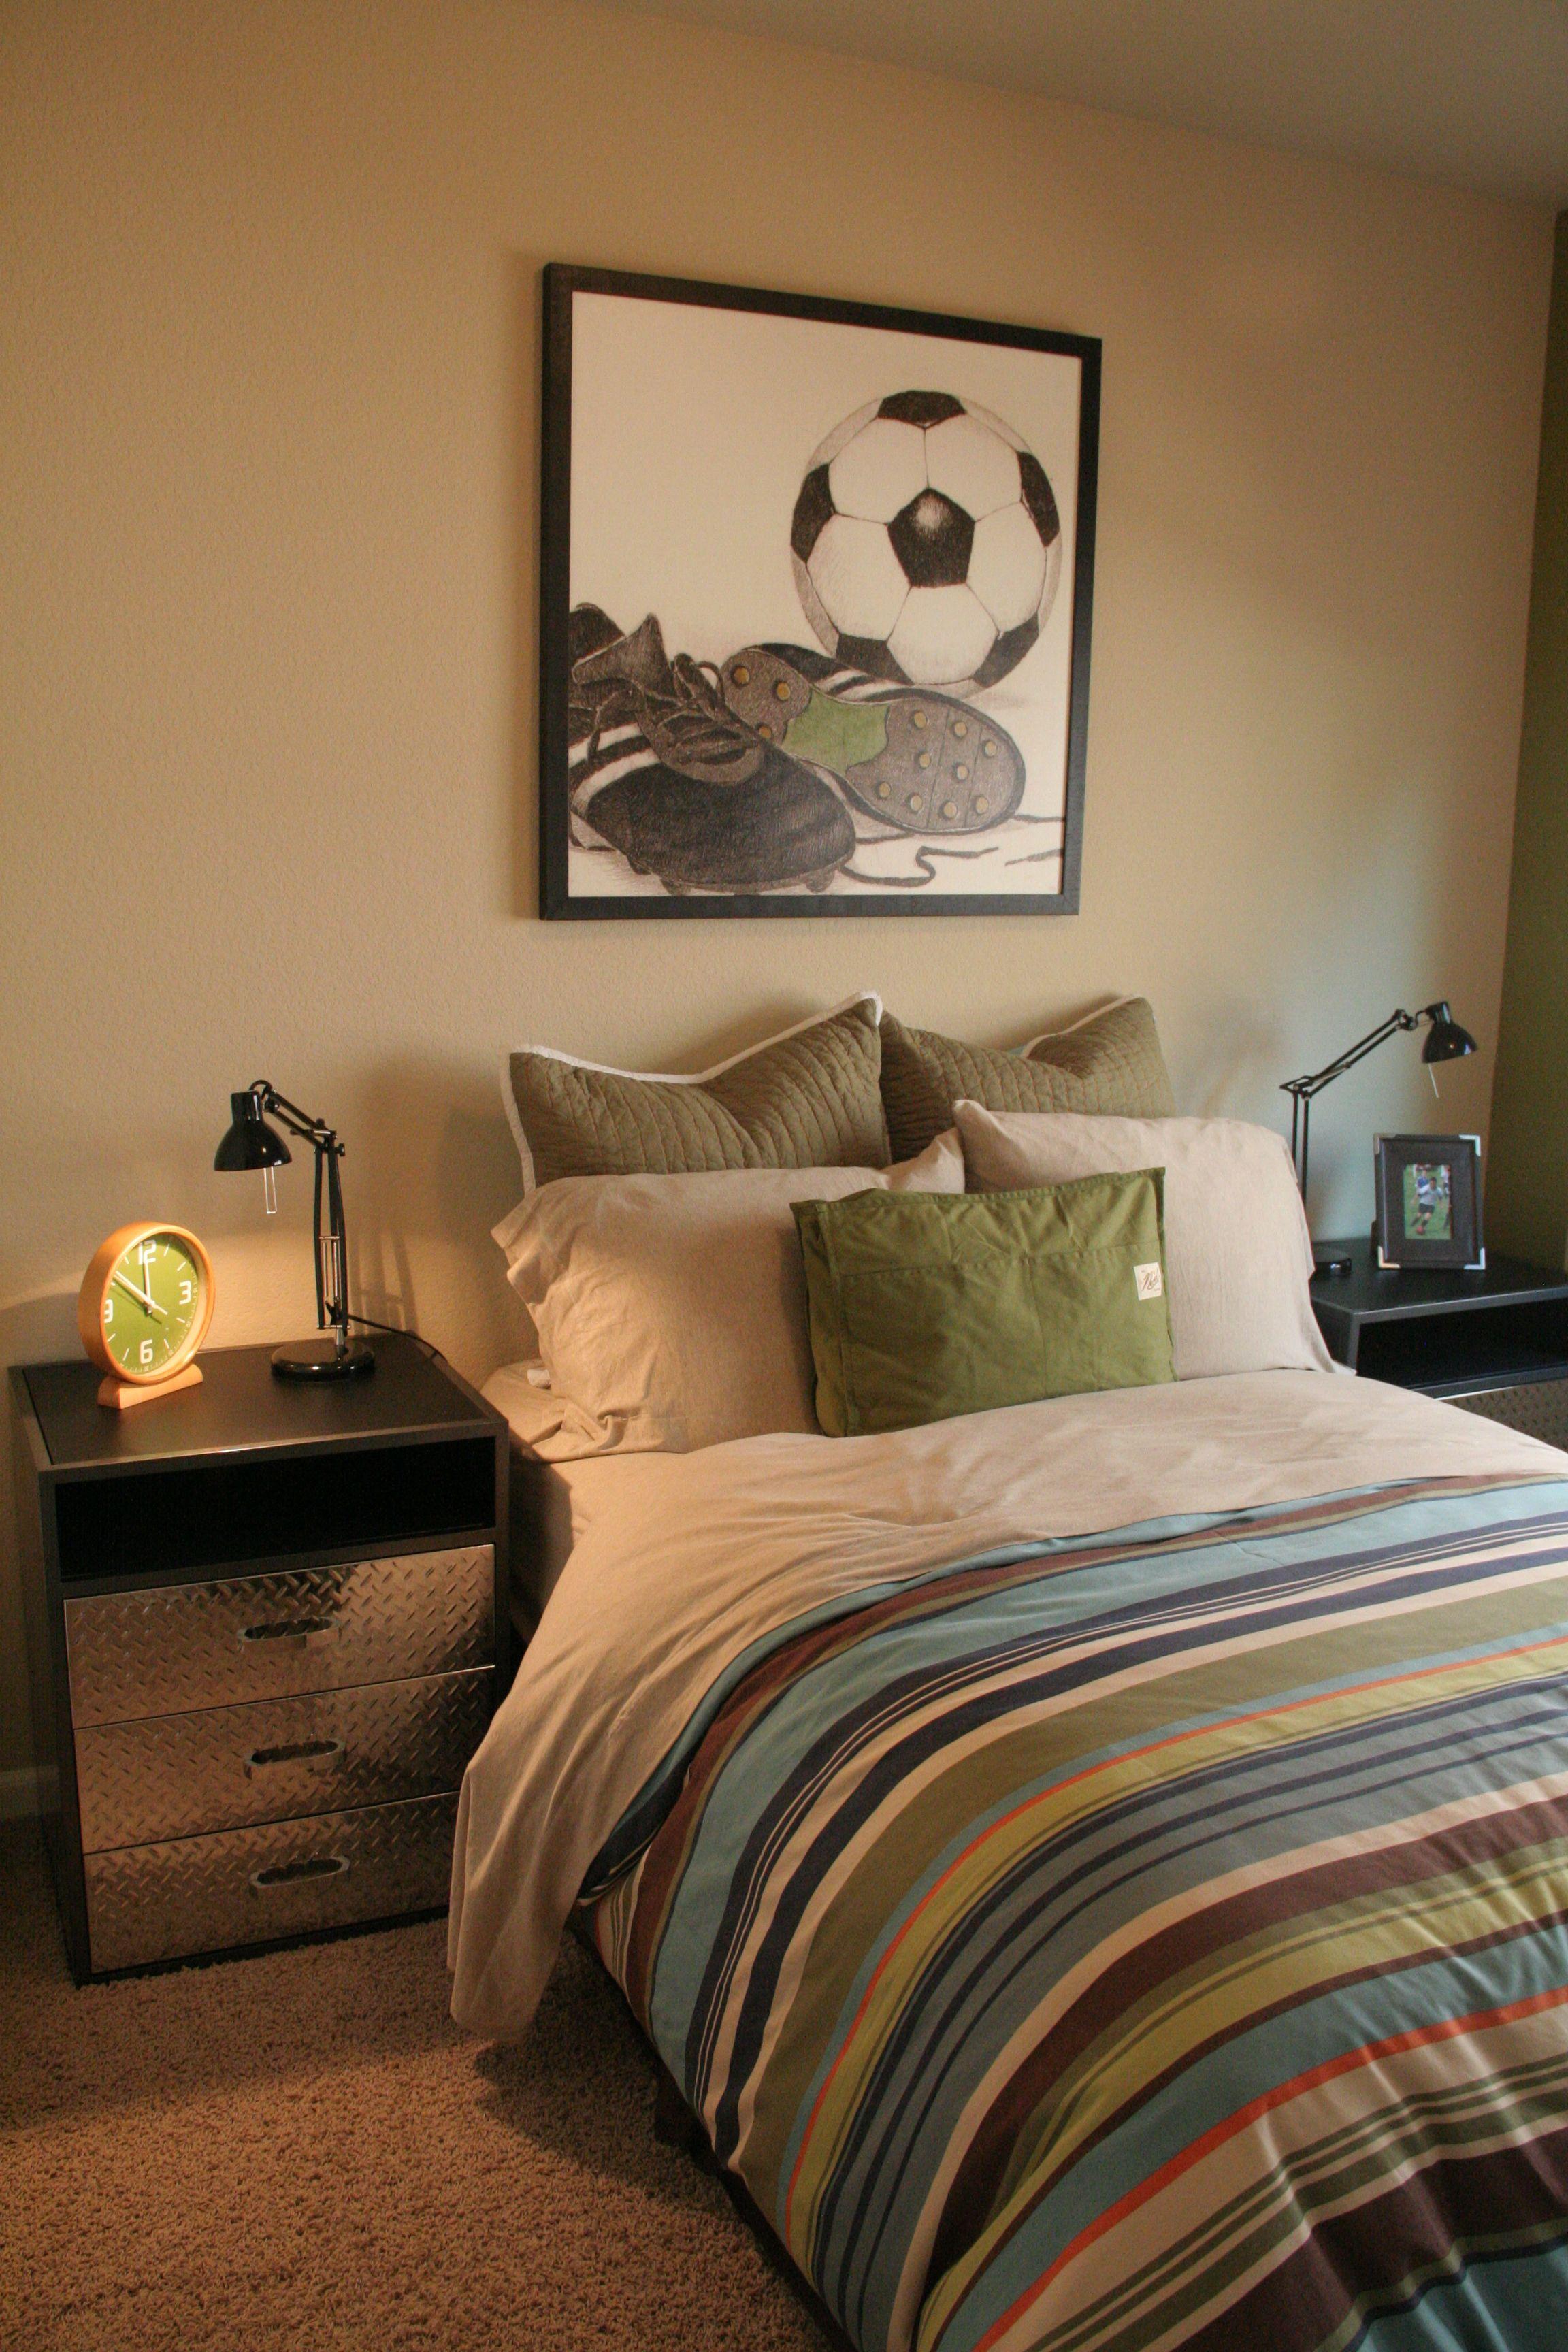 A soccer fan's dream bedroom | Fresh bedroom decor ...